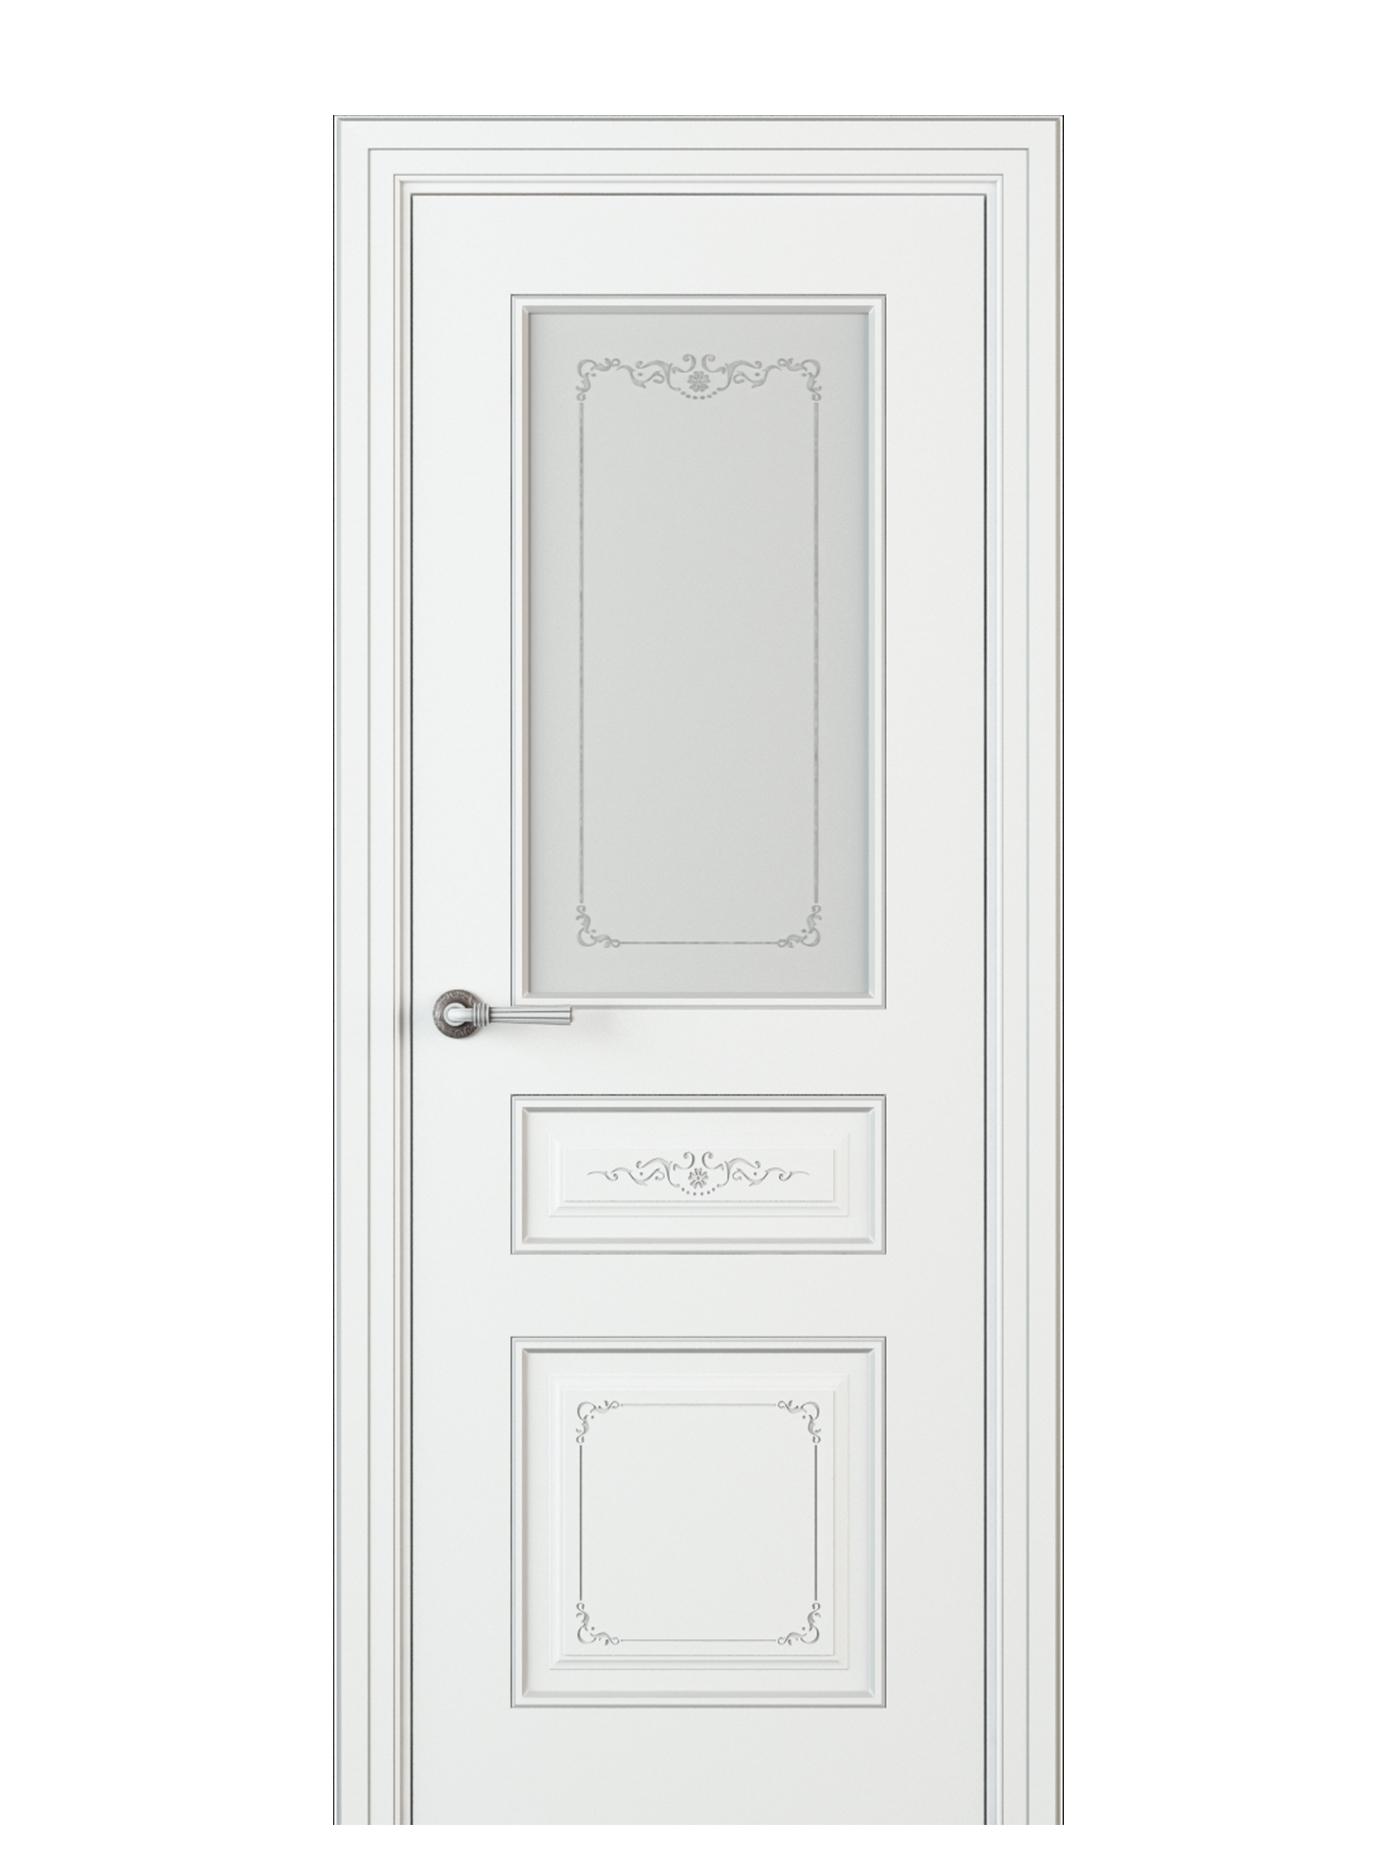 Image Fabrizia Vetro Interior Door Italian Enamel White 0